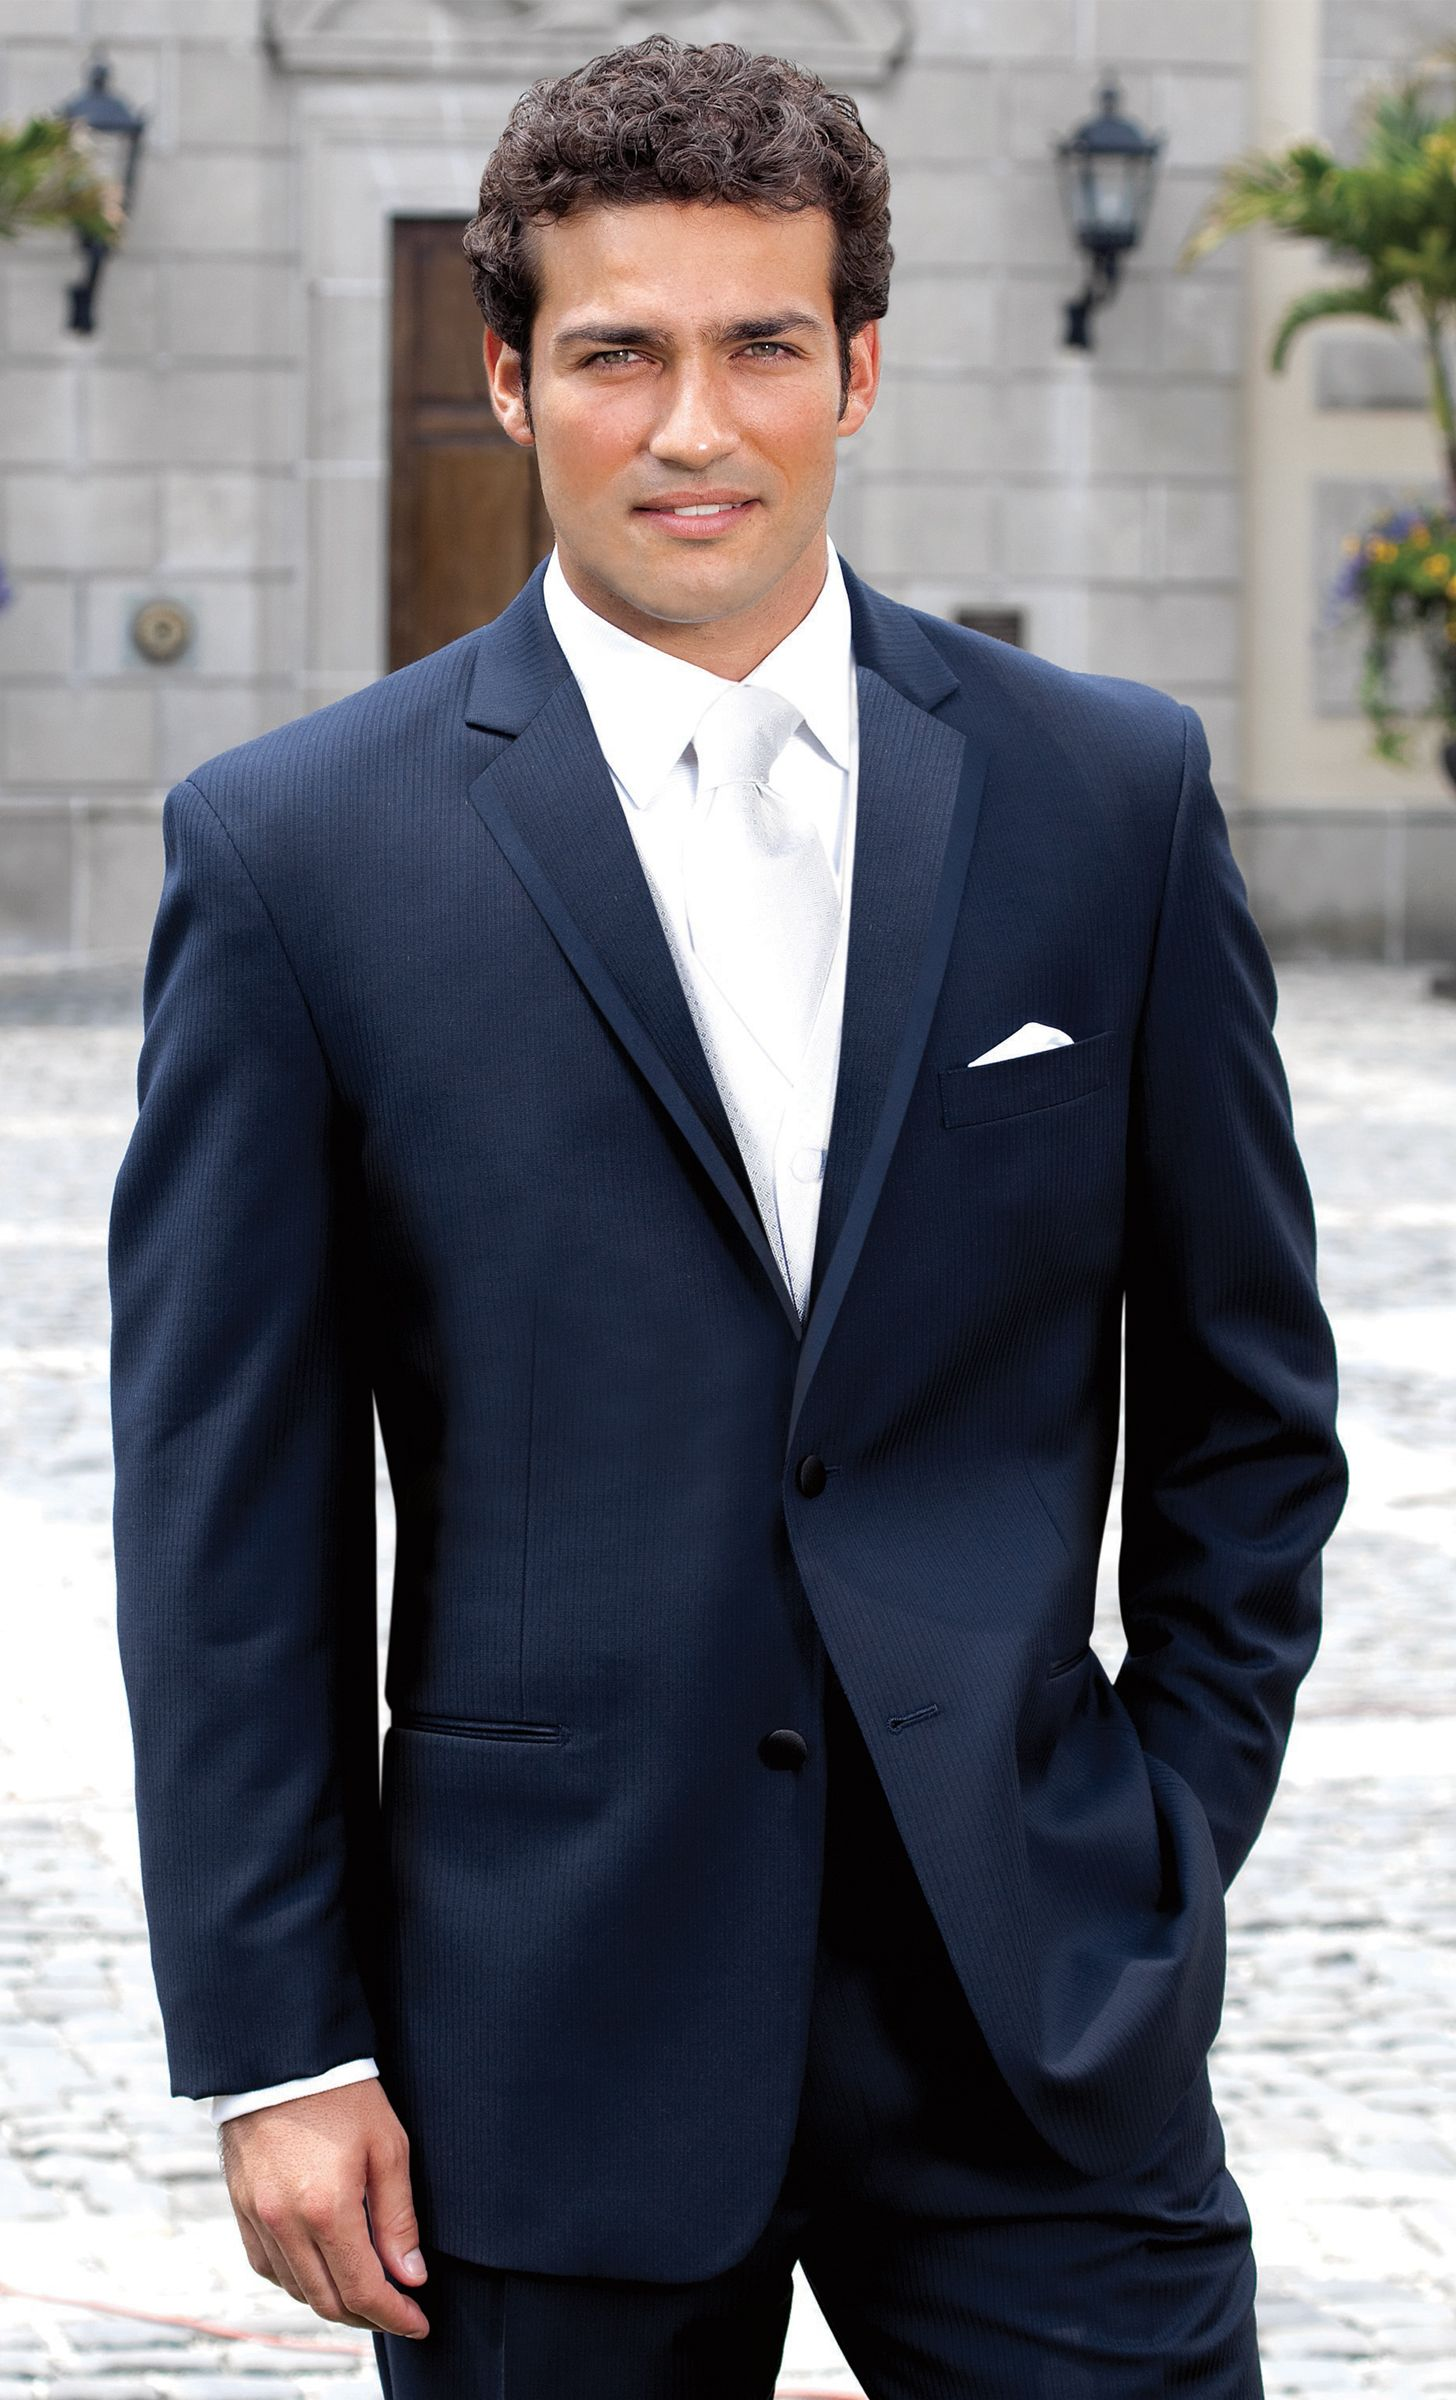 Tuxedos By Designer Tux Als Formal Wear Savvi Formalwear